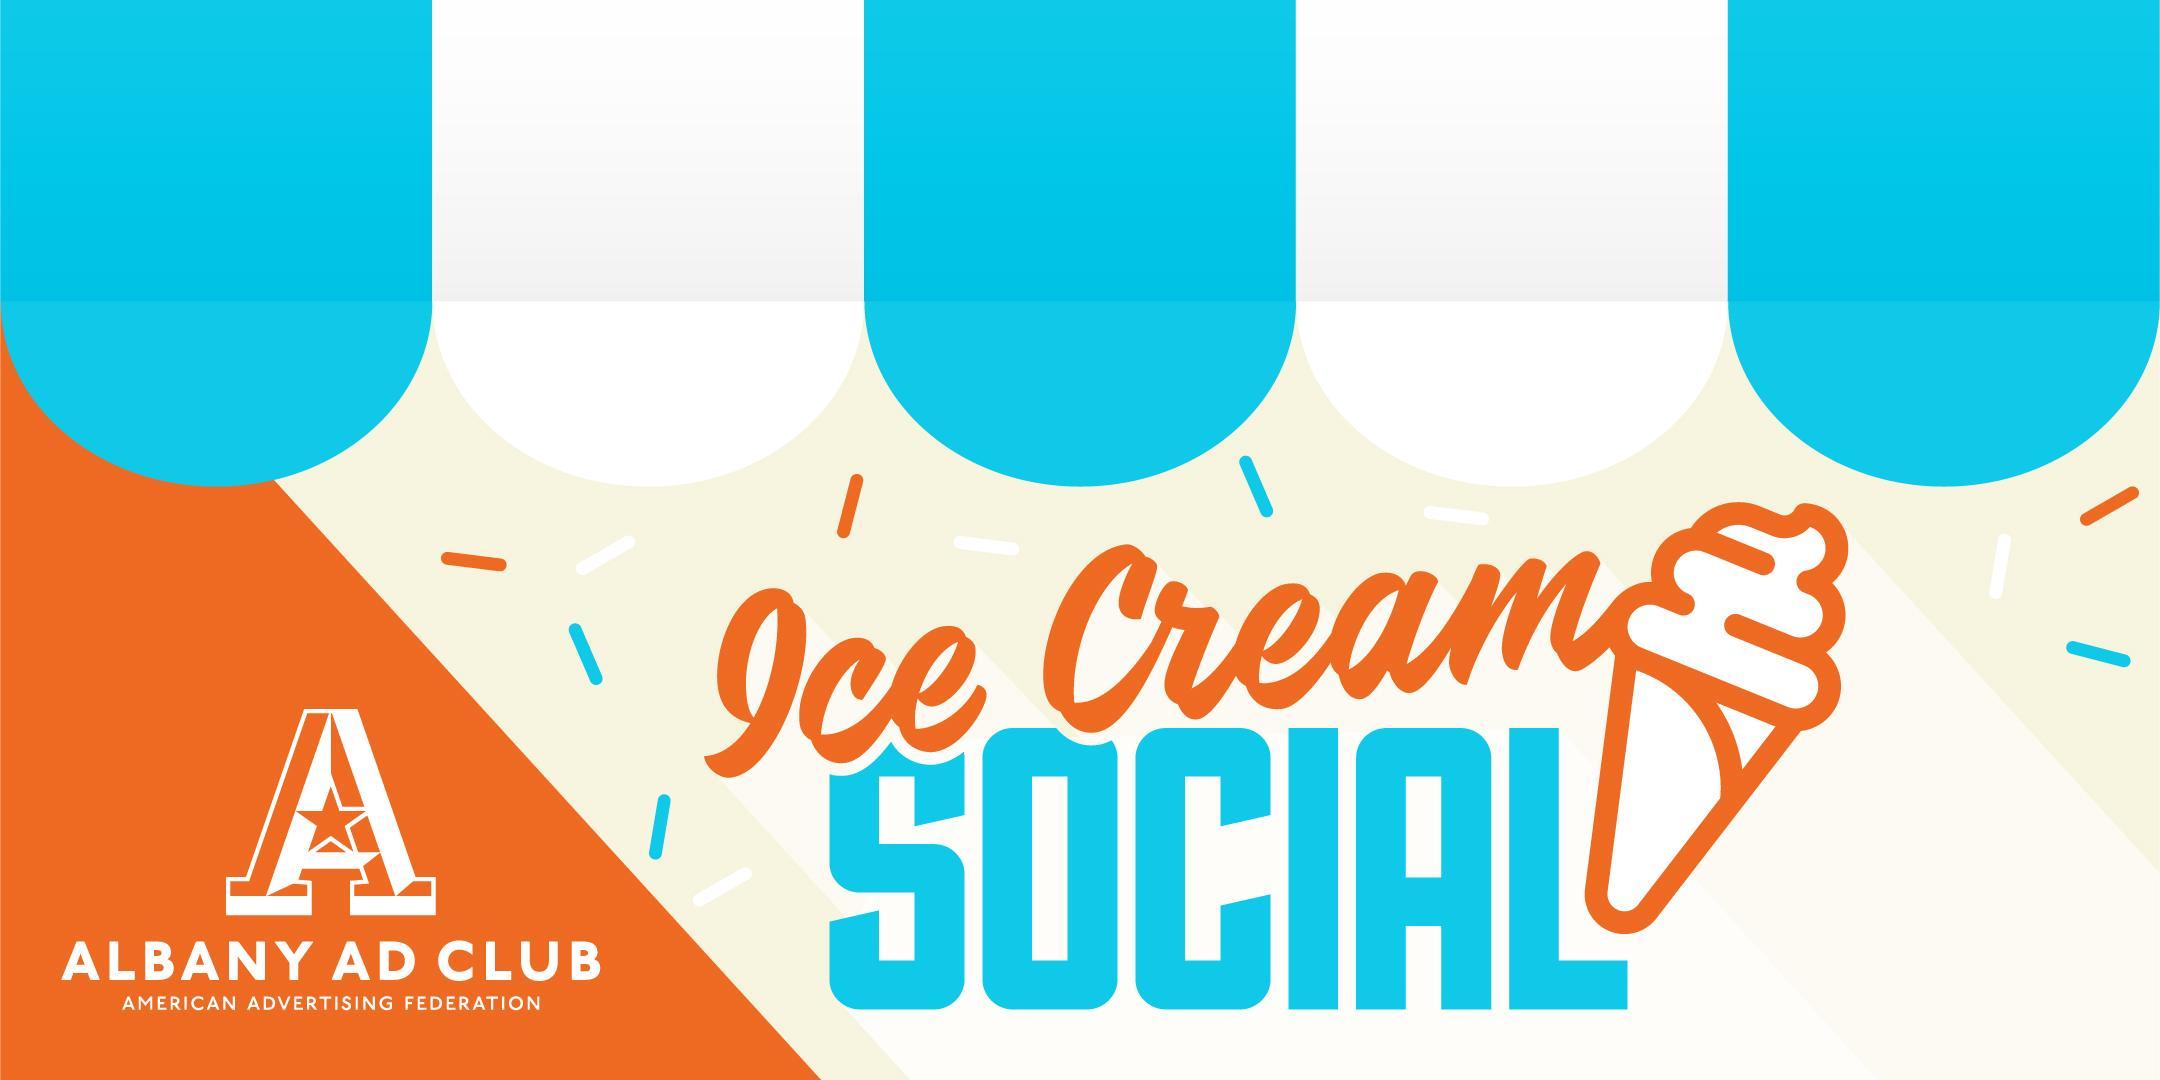 Albany Ad Club Ice Cream Social - JULY